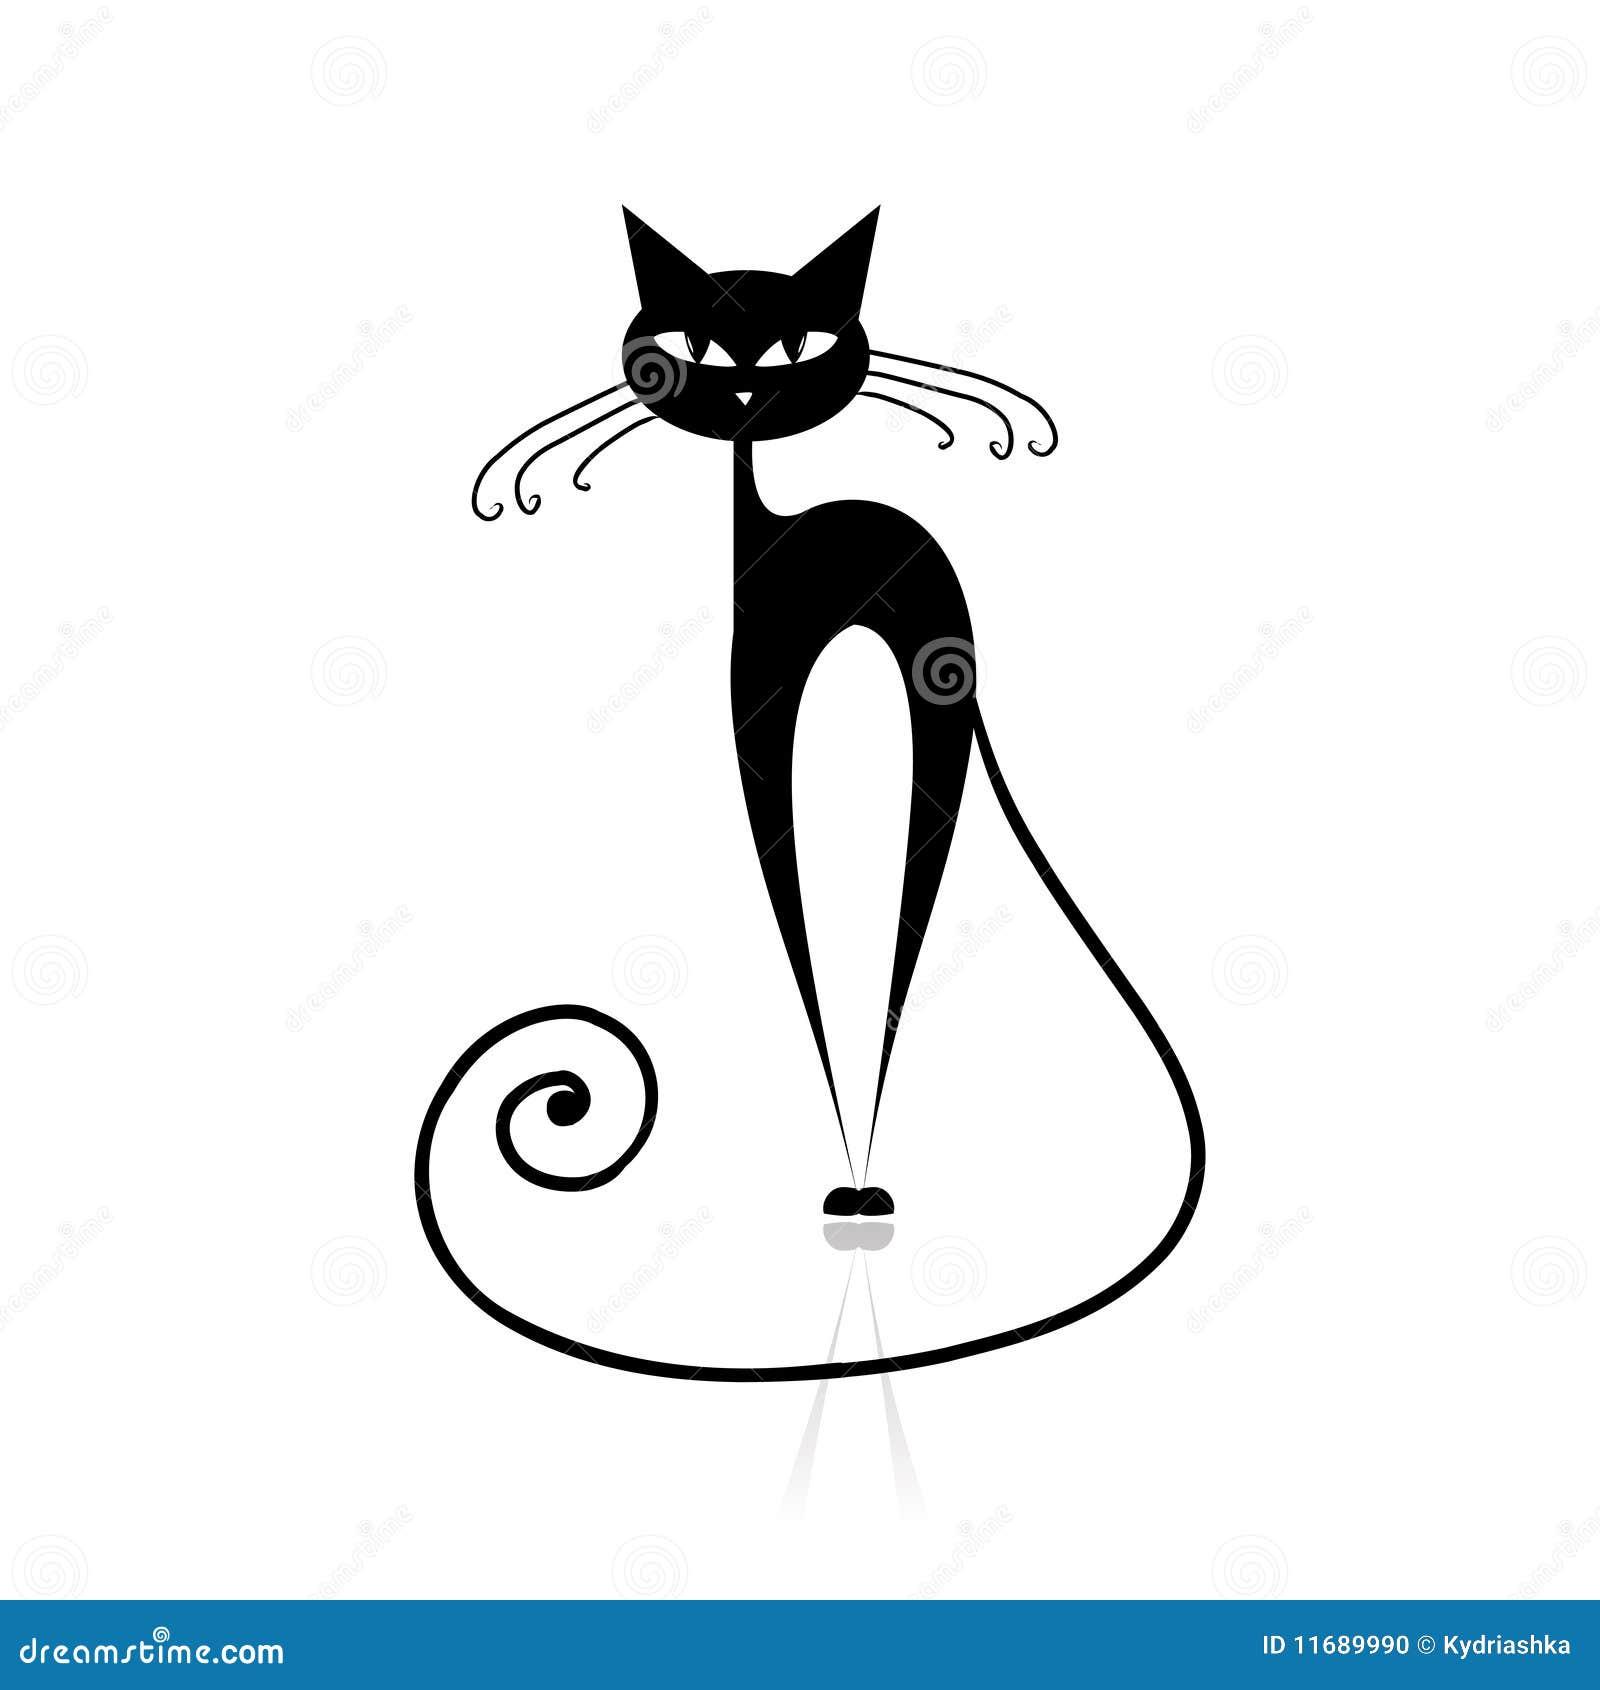 silueta de gato negro - photo #29